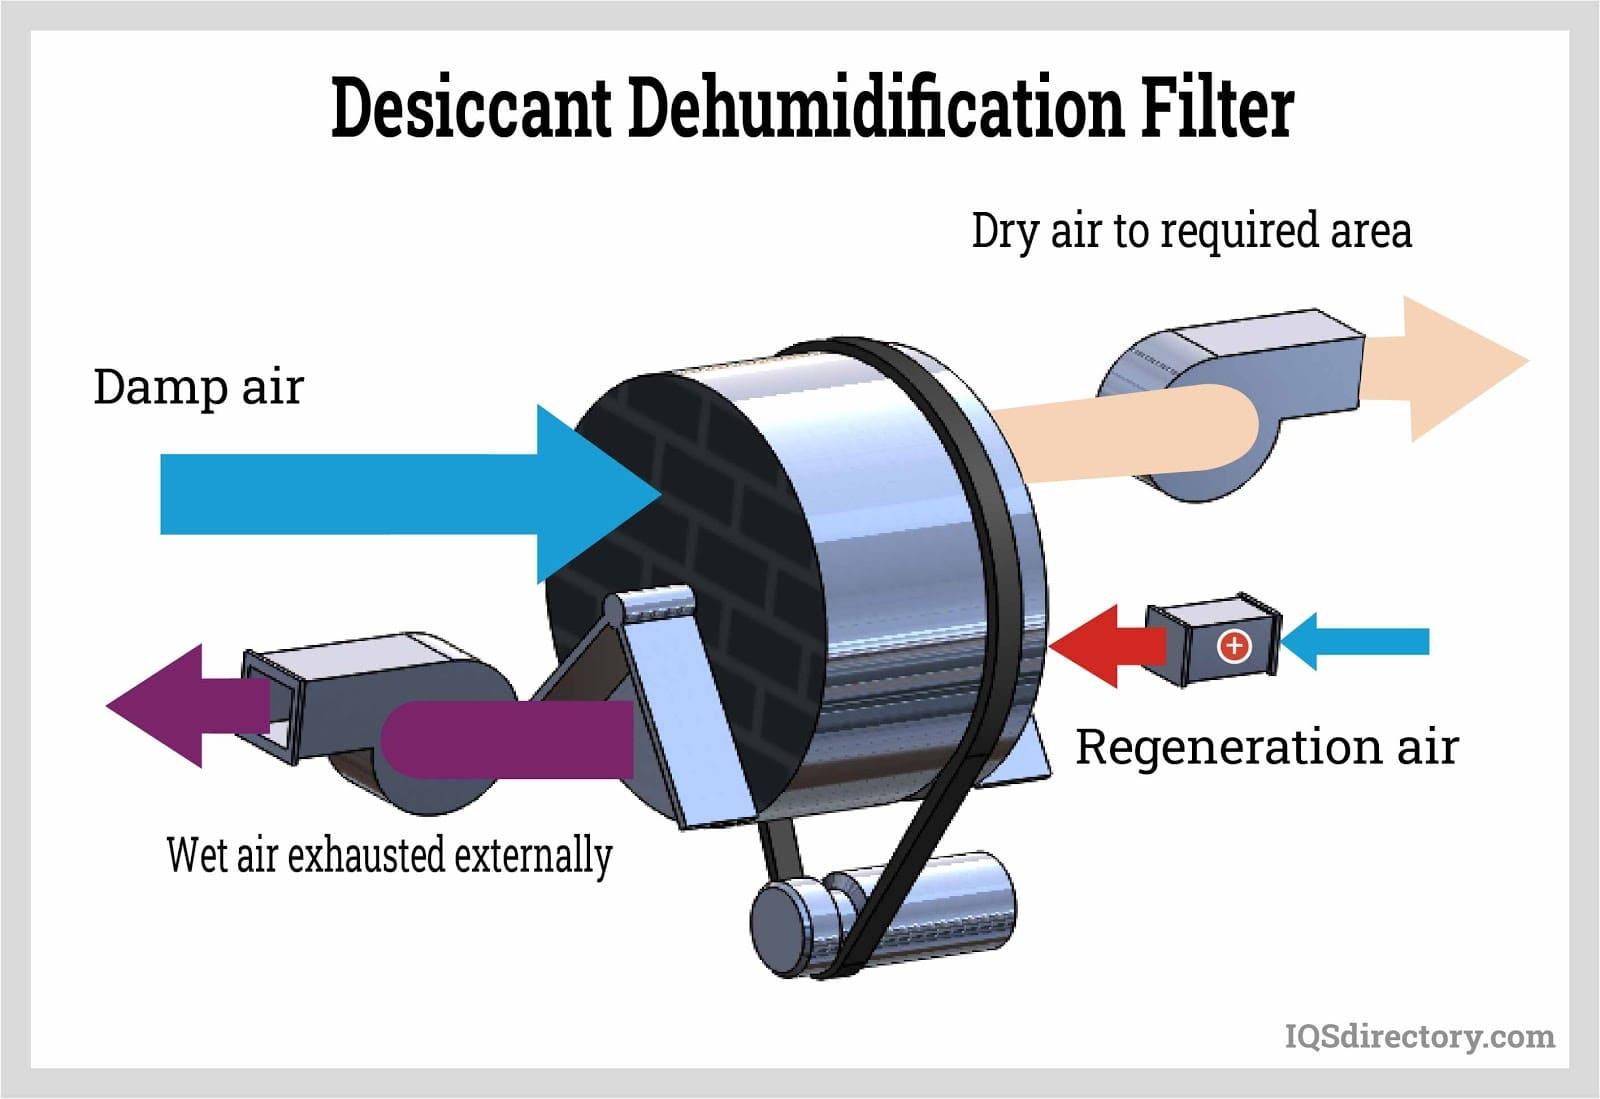 Desiccant Dehumidification Filter